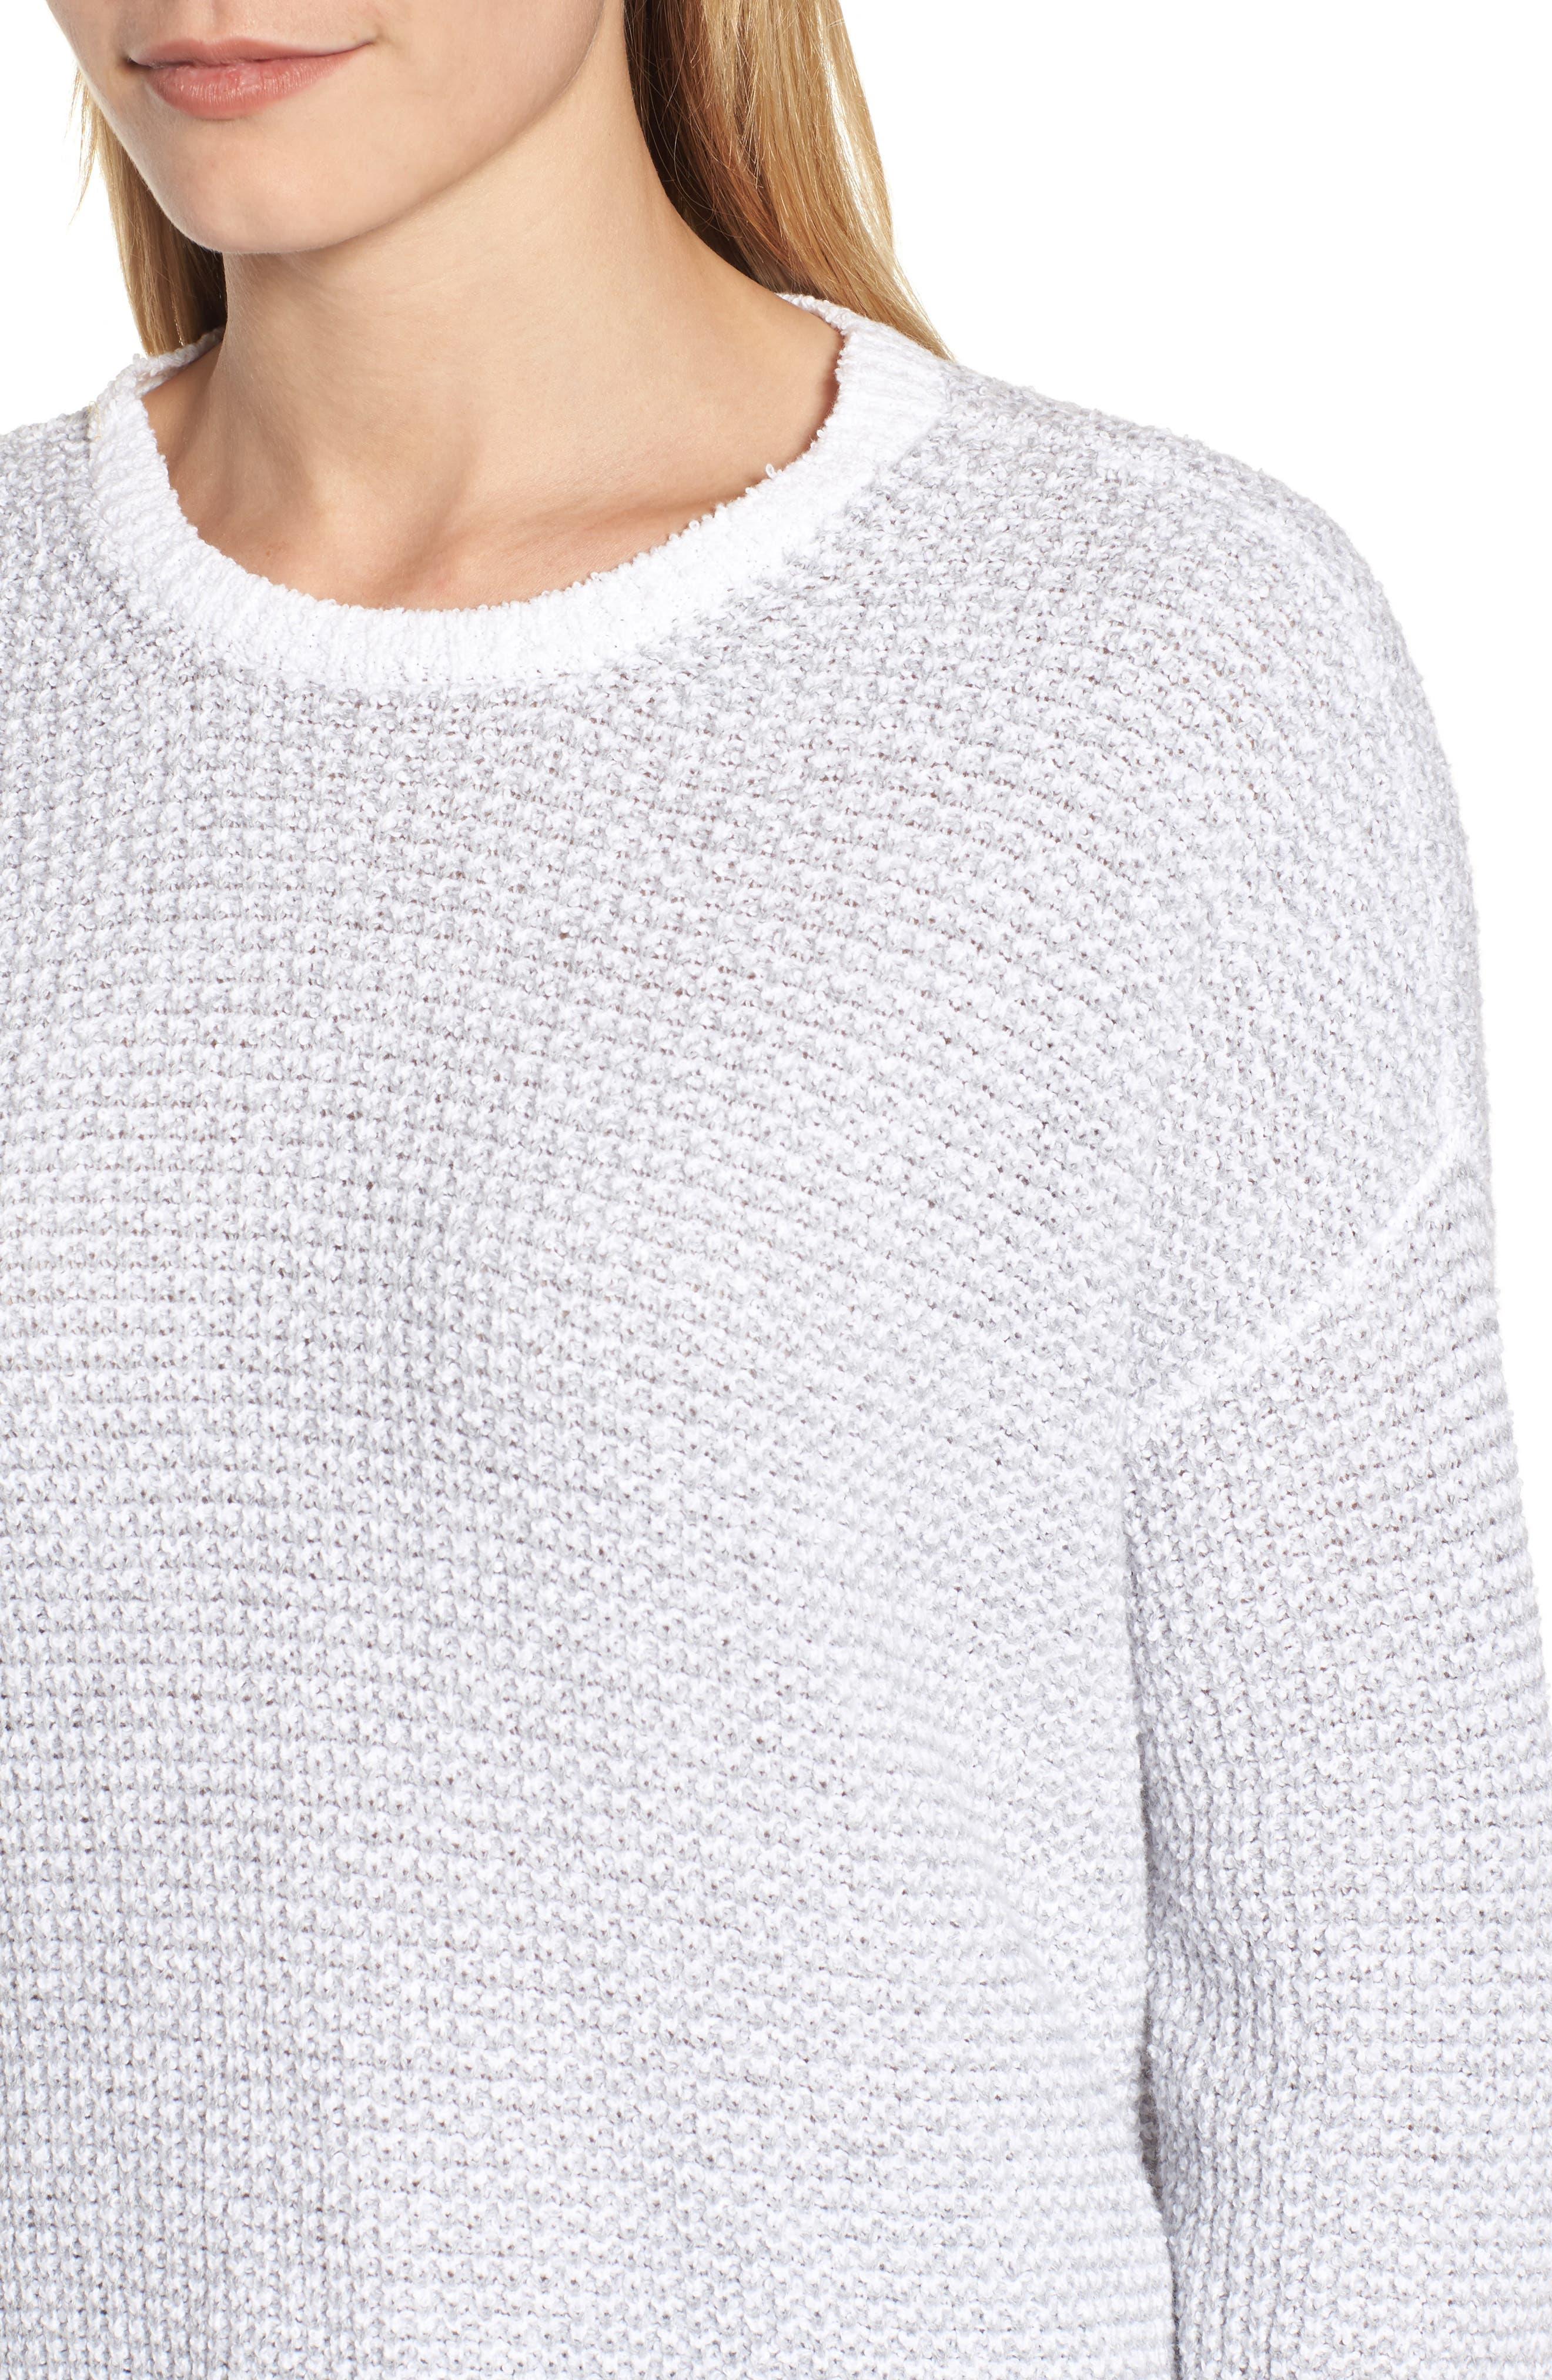 Waffled Organic Cotton Sweater,                             Alternate thumbnail 4, color,                             Dark Pearl